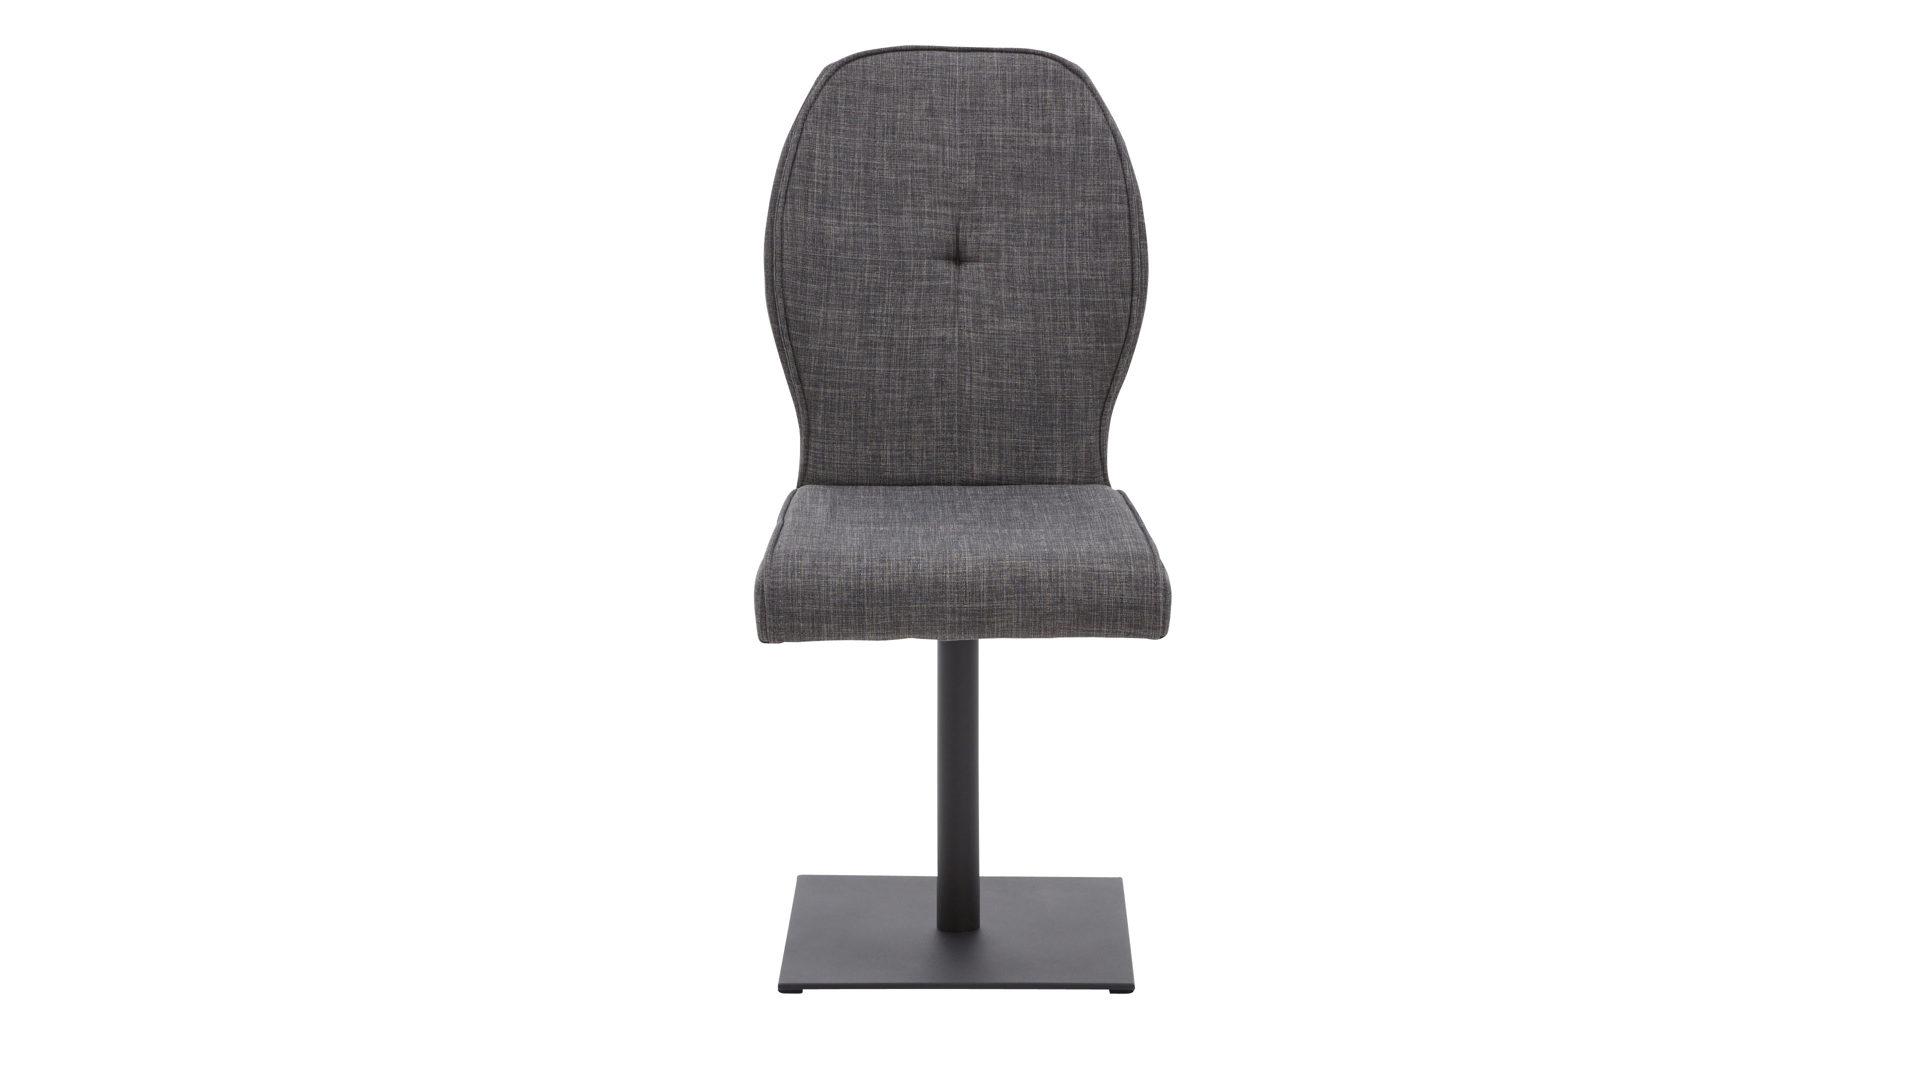 Möbel Brameyer Möbel A Z Stühle Bänke Esszimmerstühle